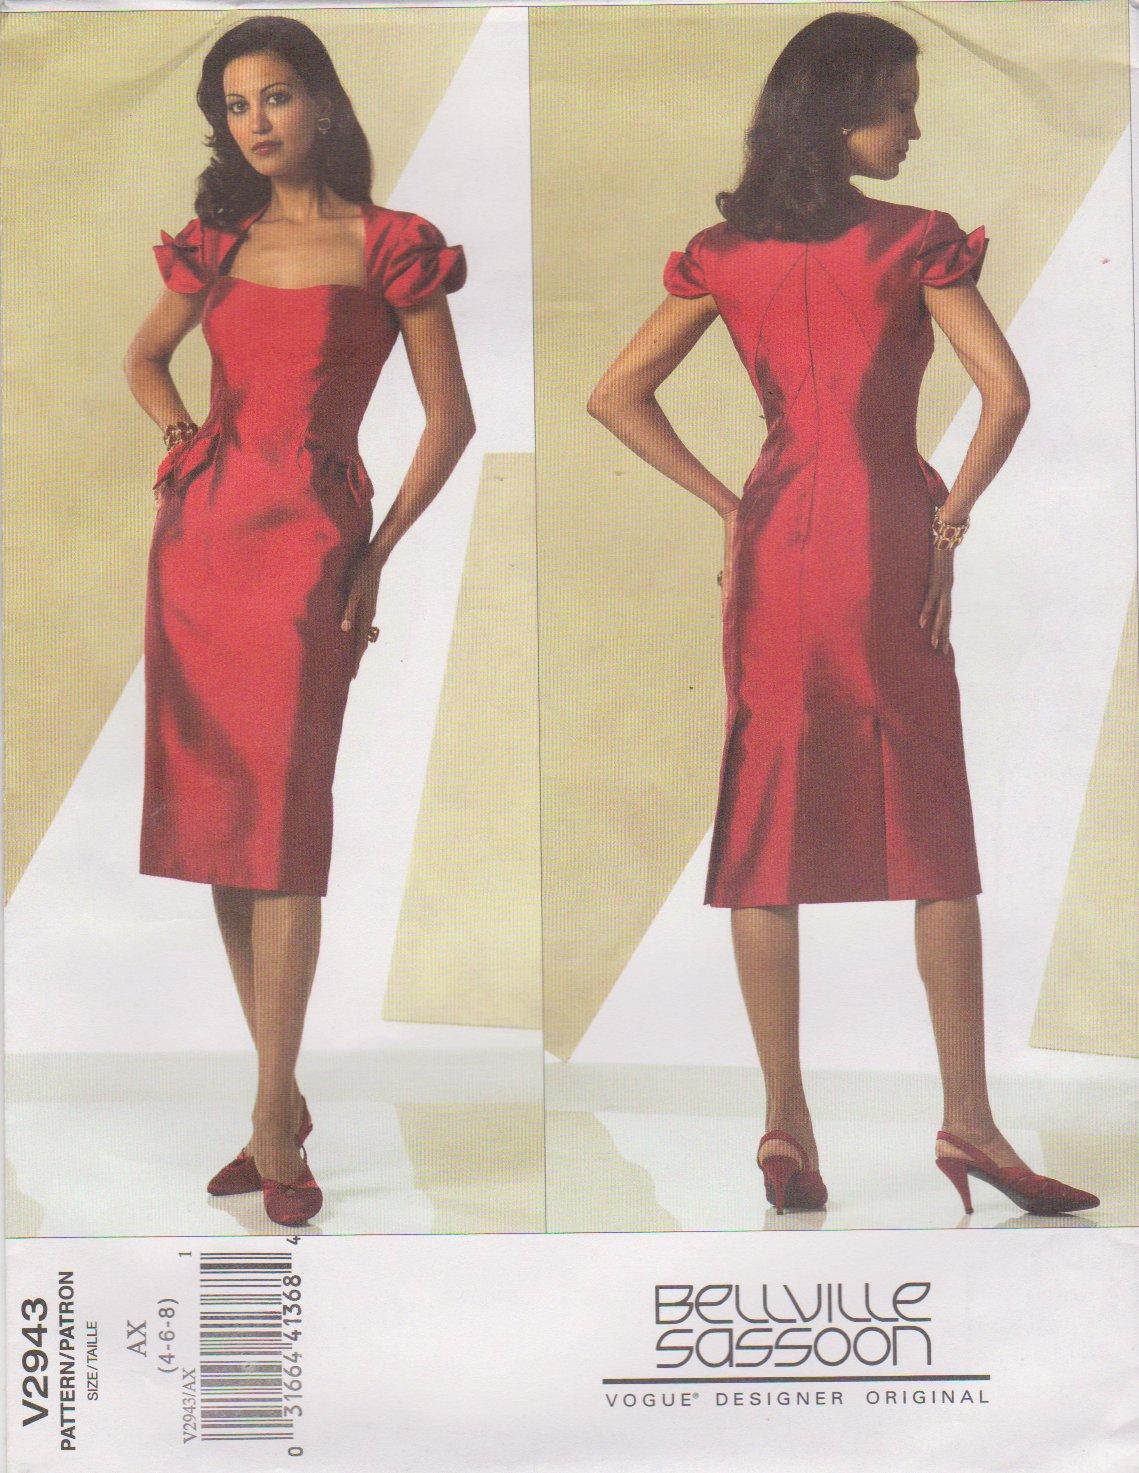 Vogue Sewing Pattern 2943 V2943 Misses Size 4-8 Bellville Sassoon Short Formal Party Dress